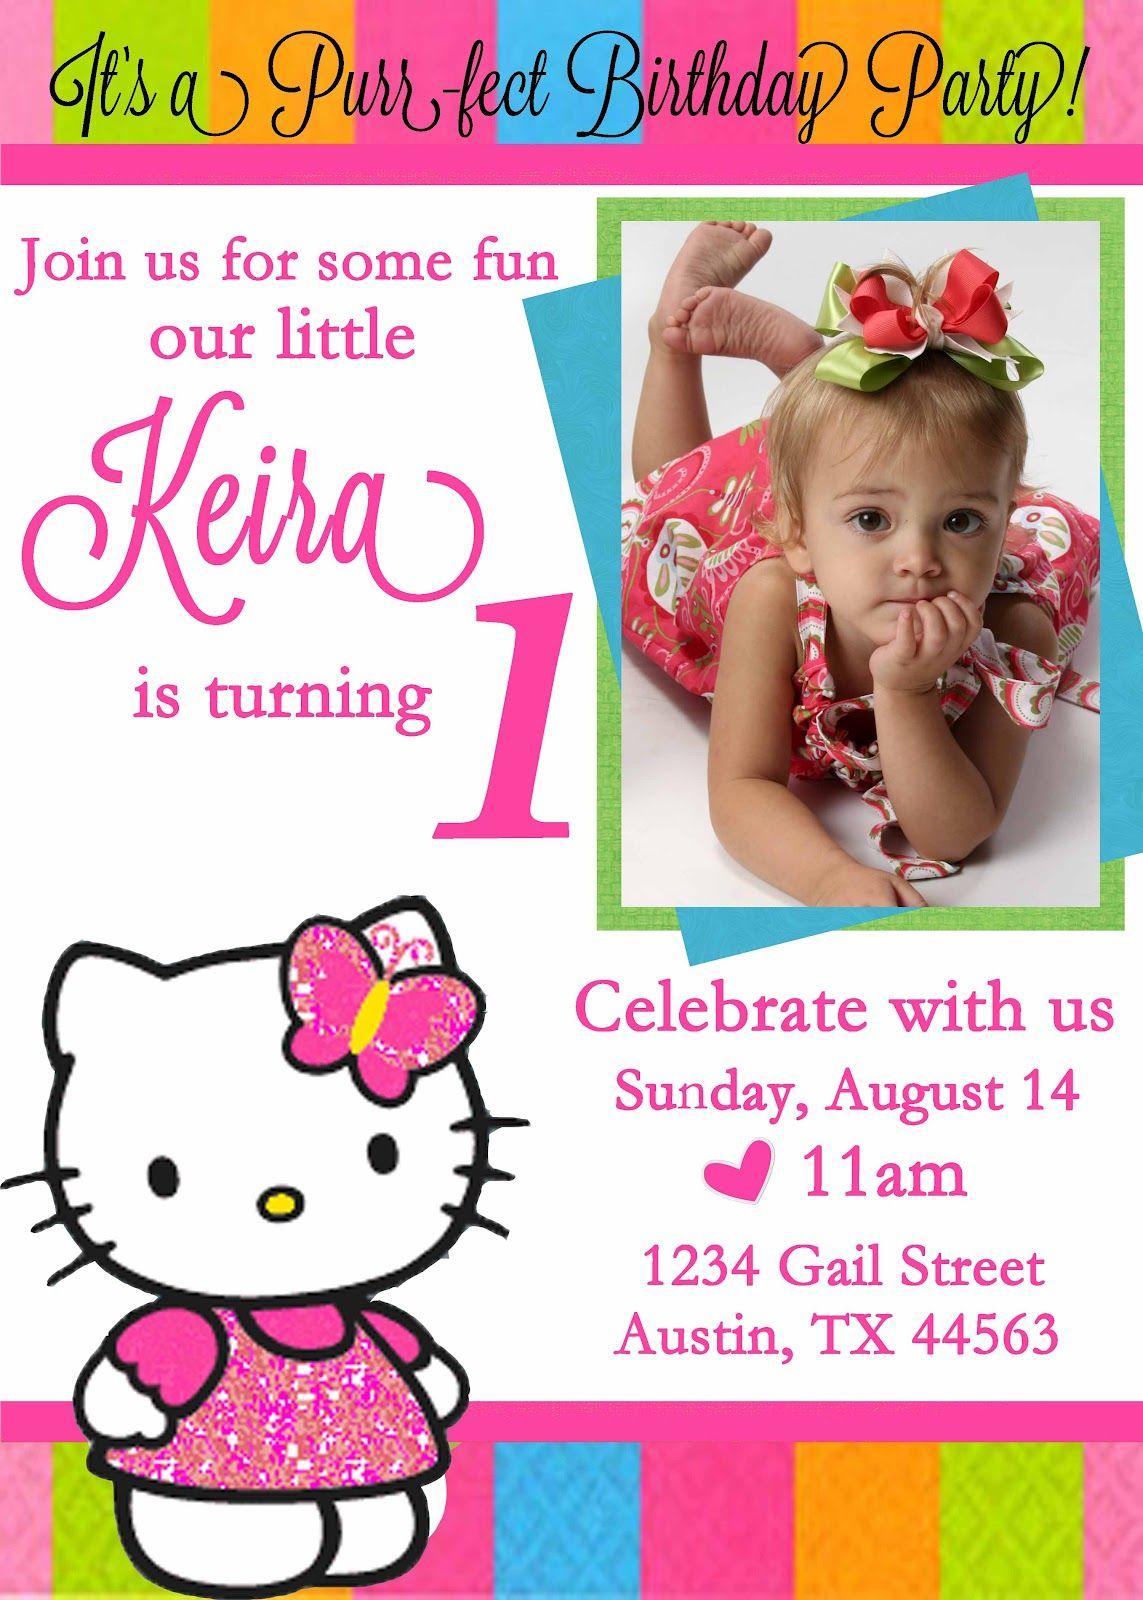 Personalized Hello Kitty Birthday Invitations -   Free Printable - Free Printable Personalized Birthday Invitation Cards